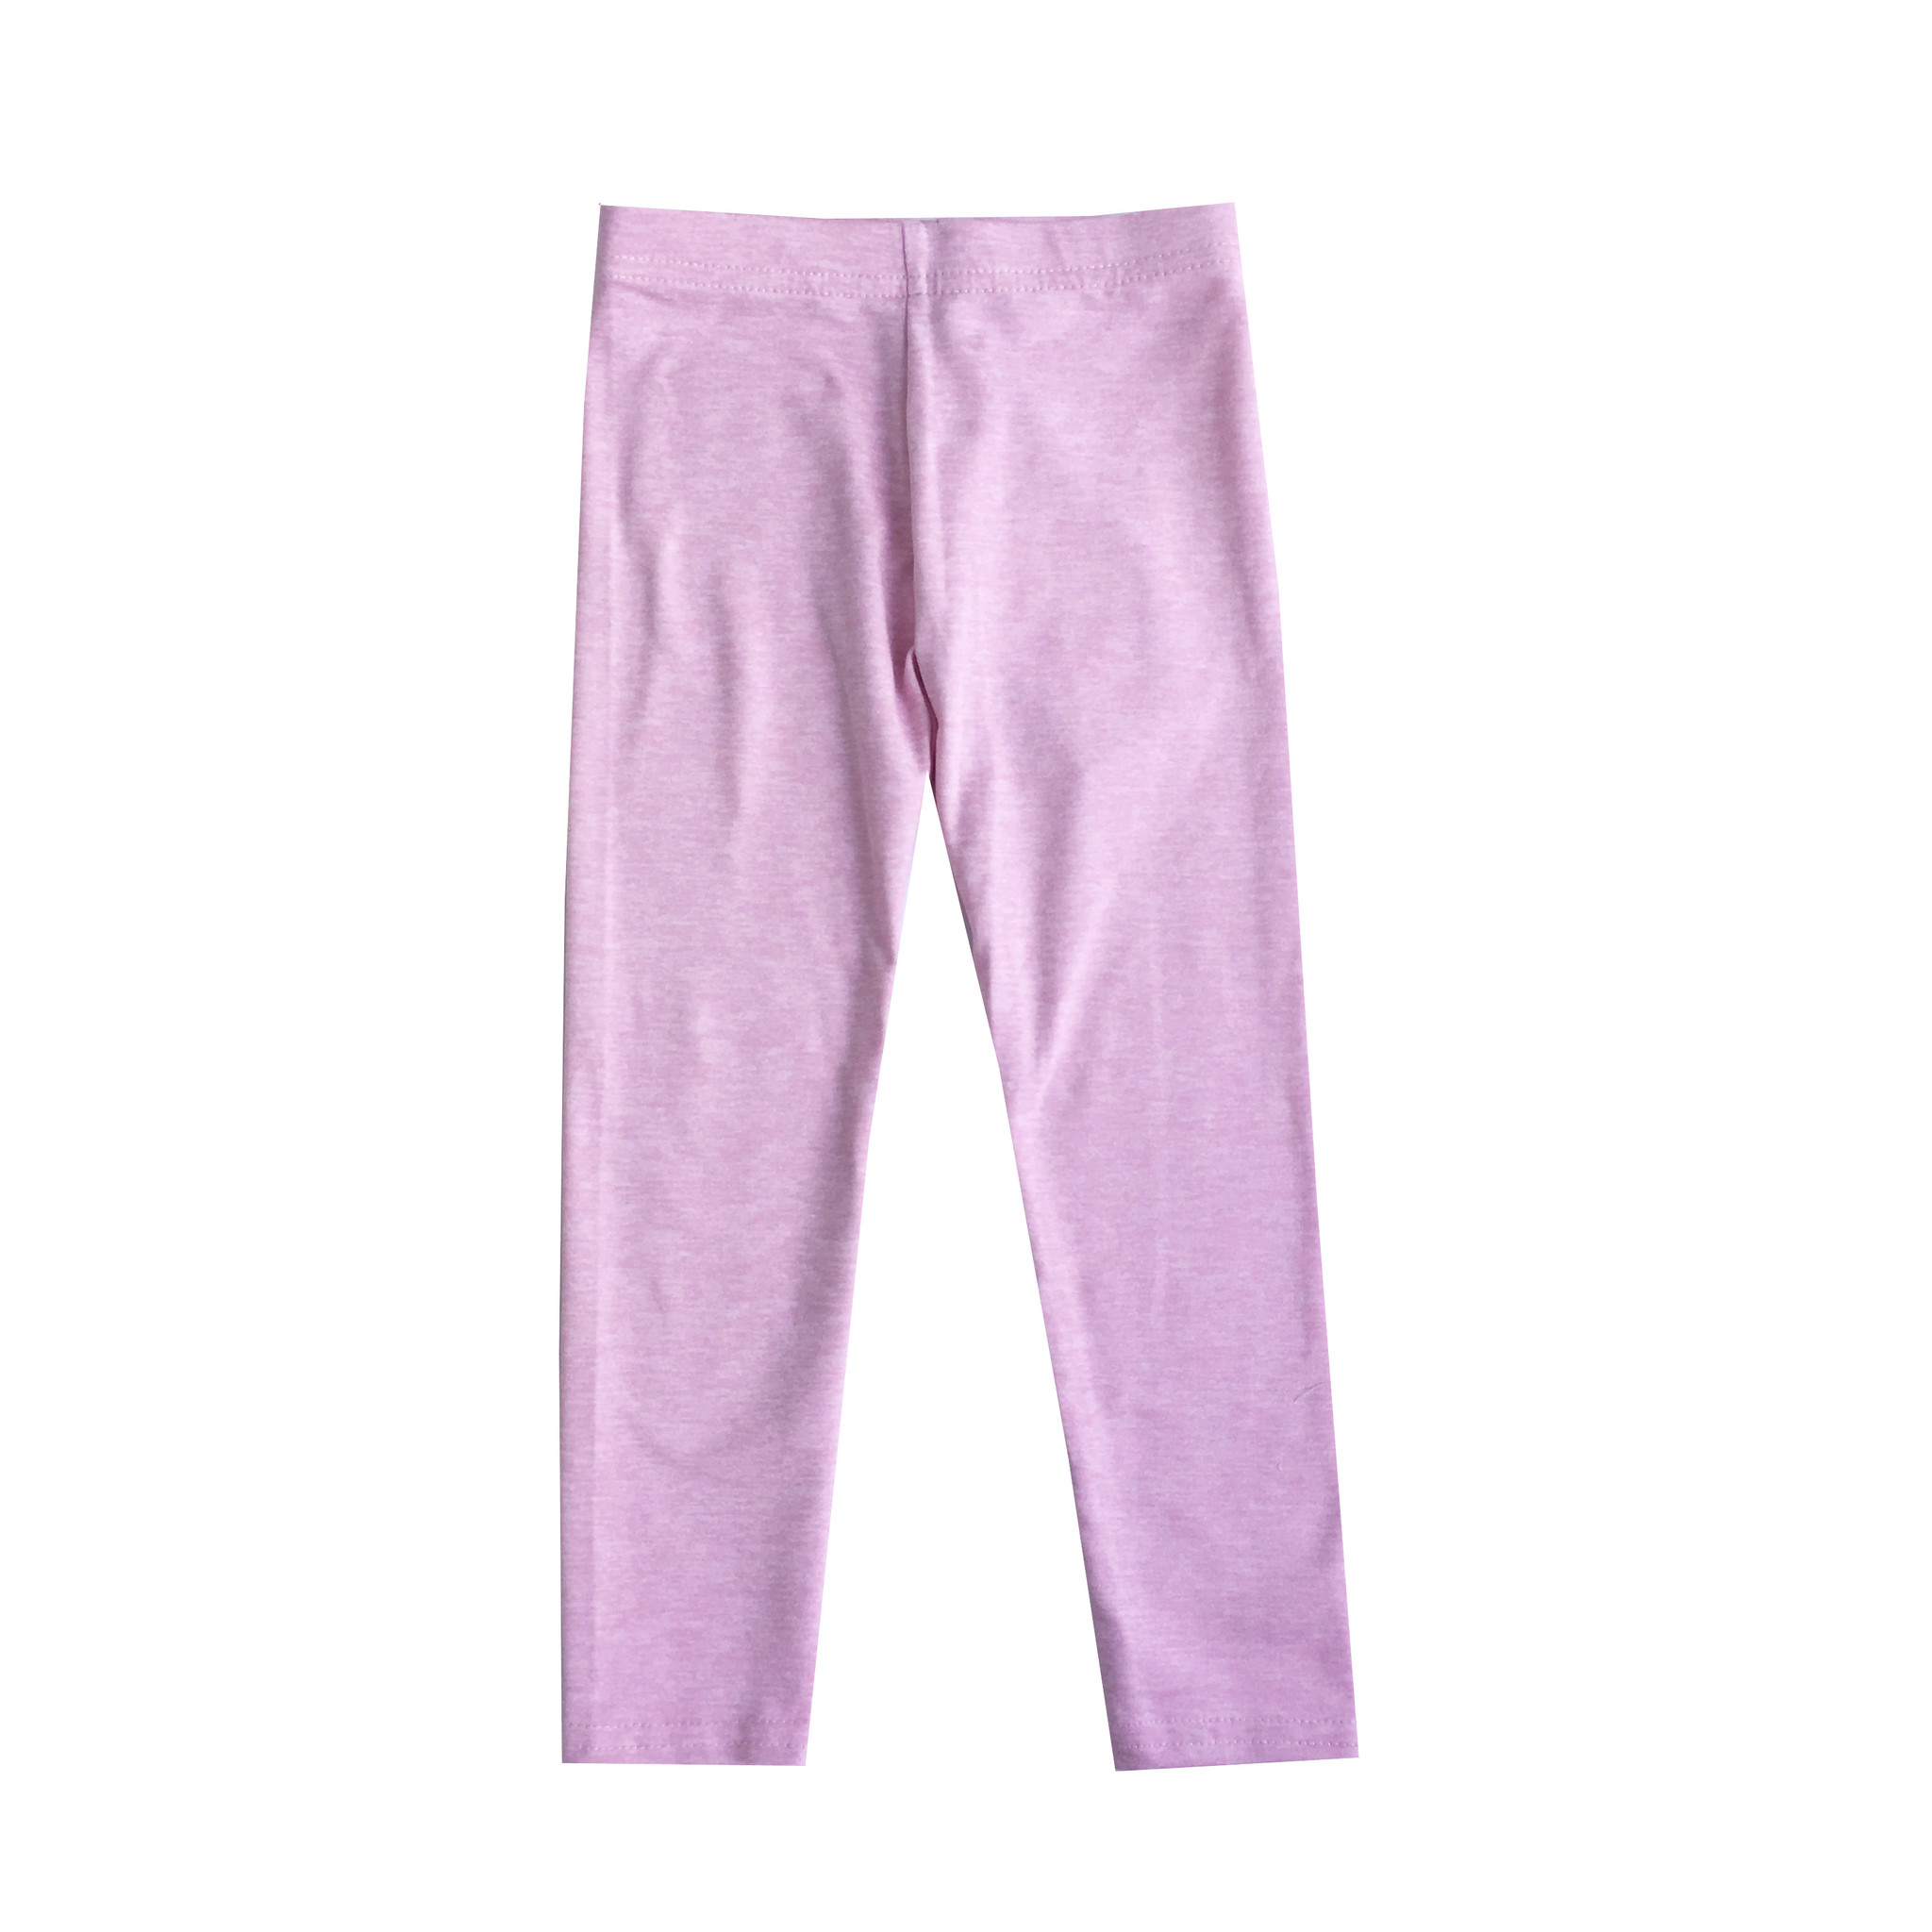 Dori Creations Lt. Pink/White Heathered Legging